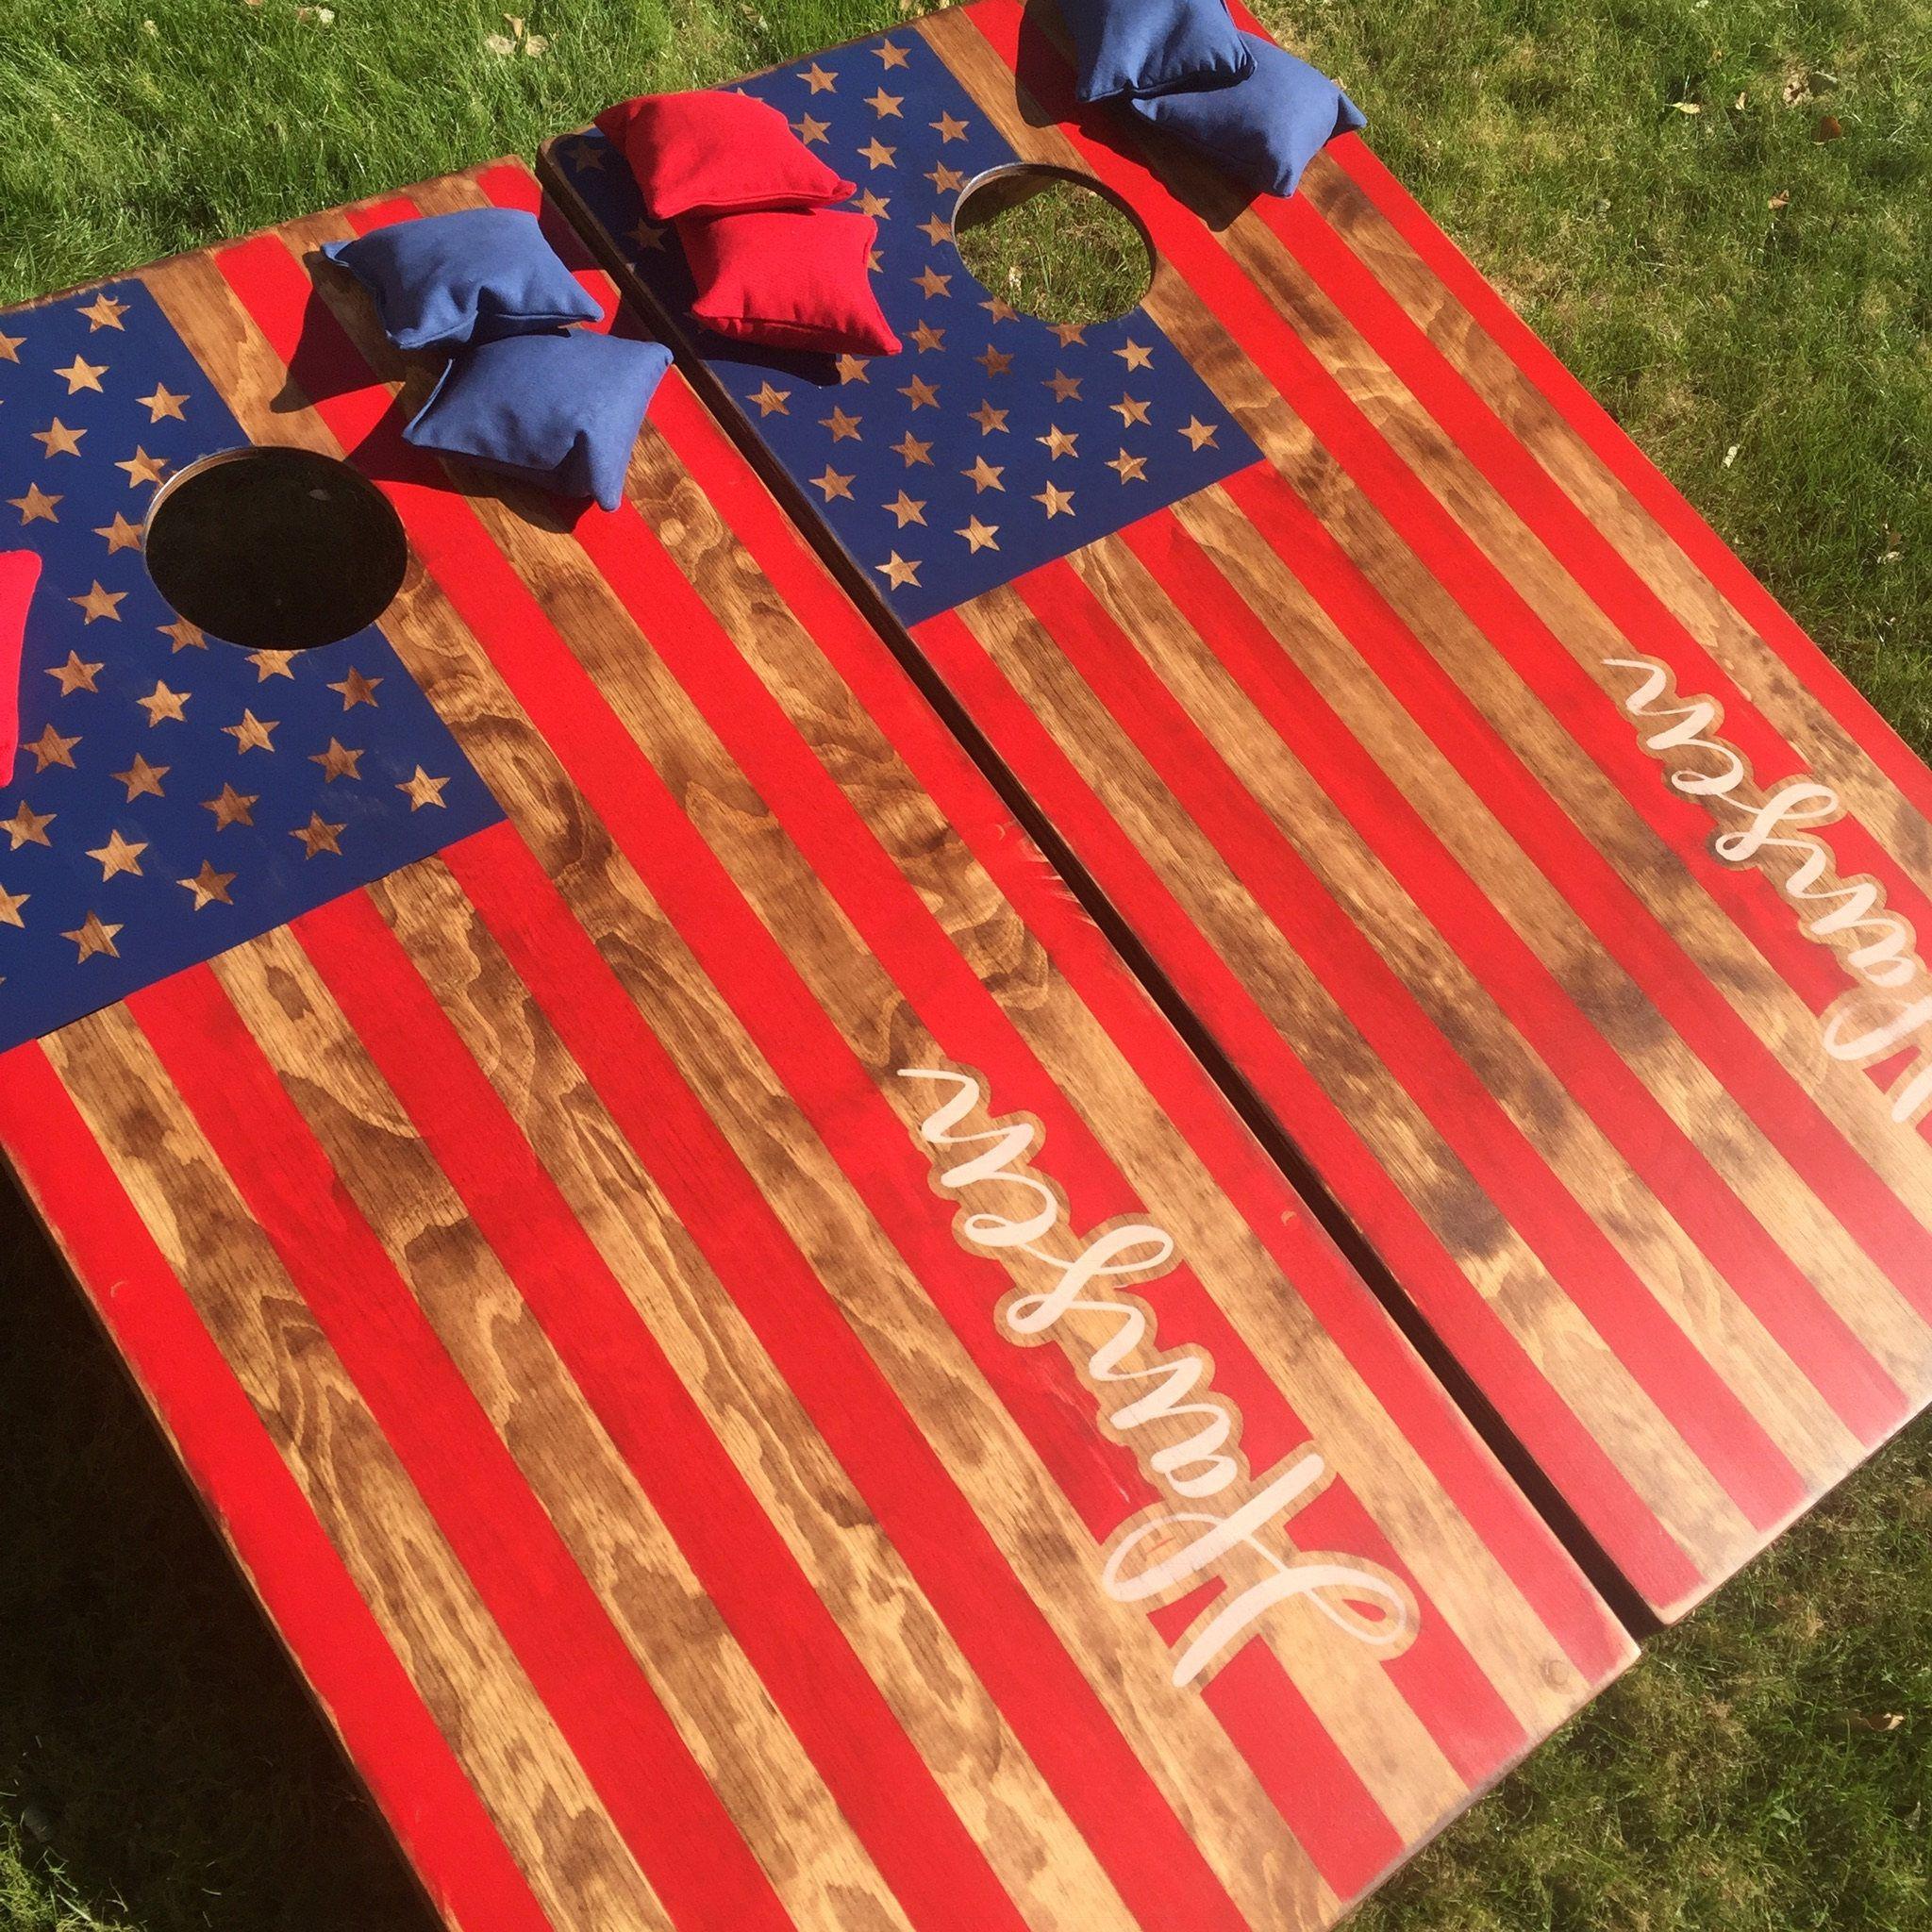 Bean Bag Toss Game American Flag Corn Hole Boards